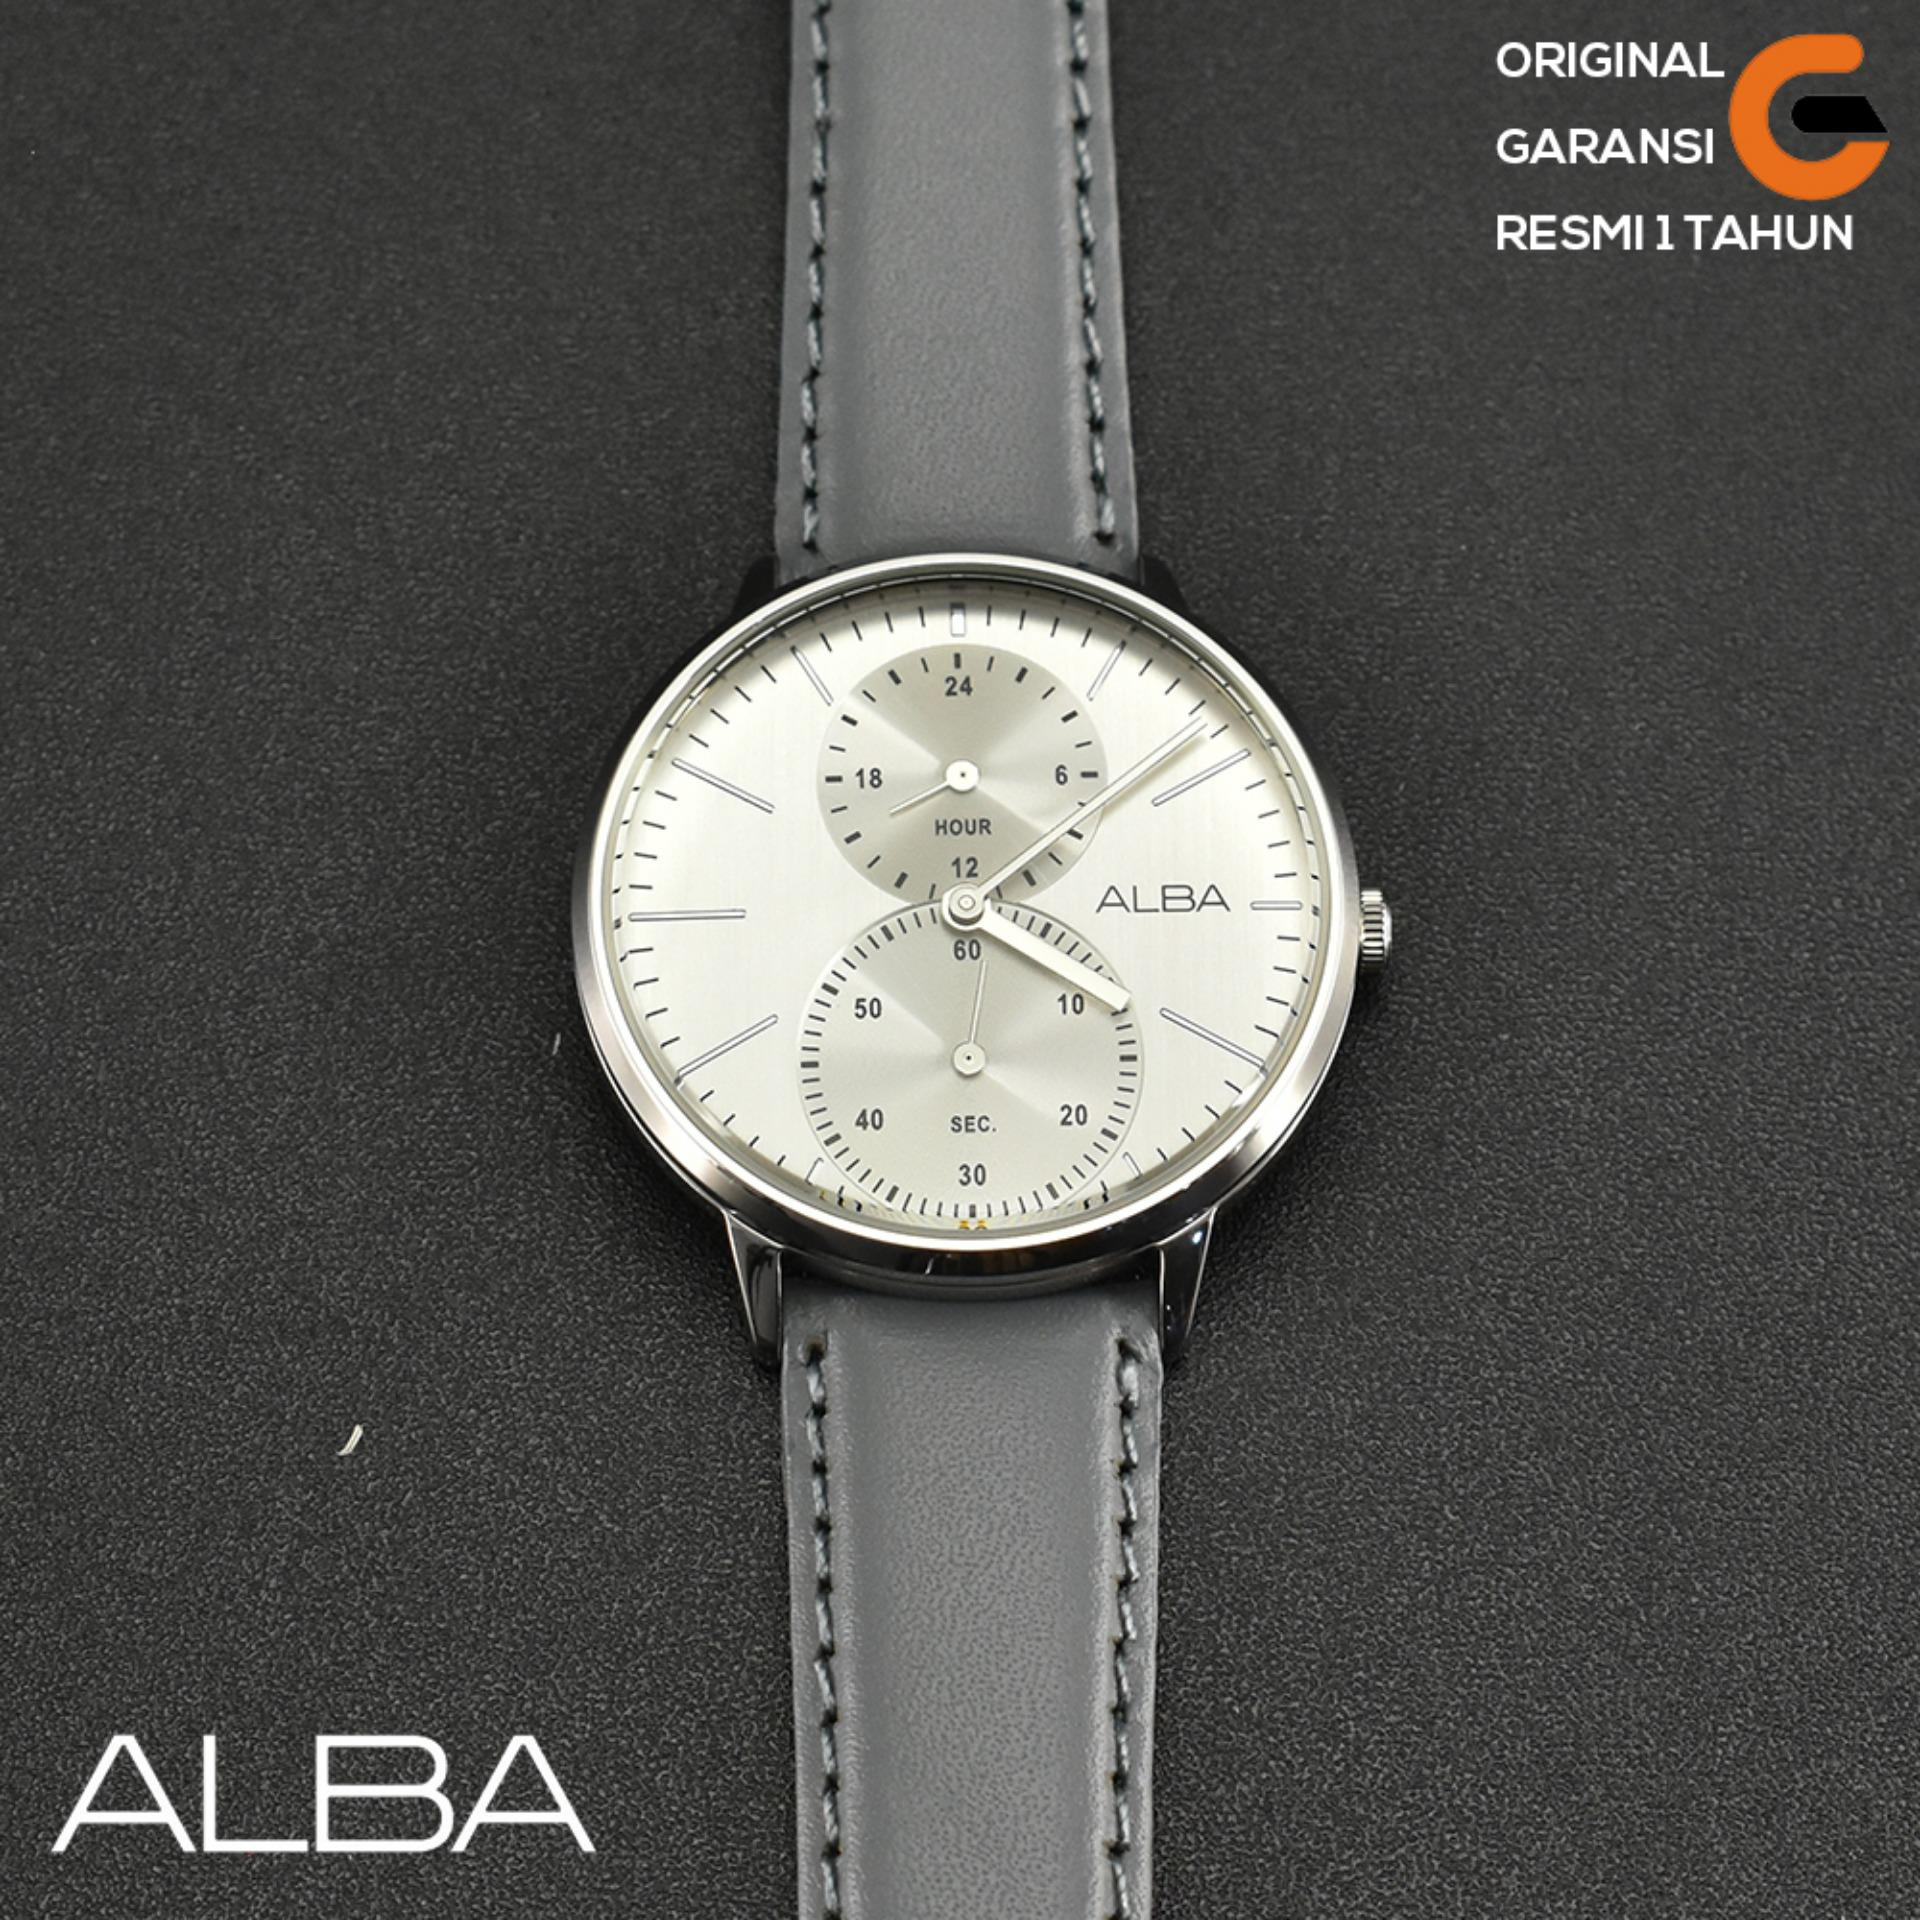 ALBA Jam Tangan Pria ALBA A3A011 Tali kulit Leather Case Stainless Steel Jam  Tangan ALBA Pria fa6c9b85aa